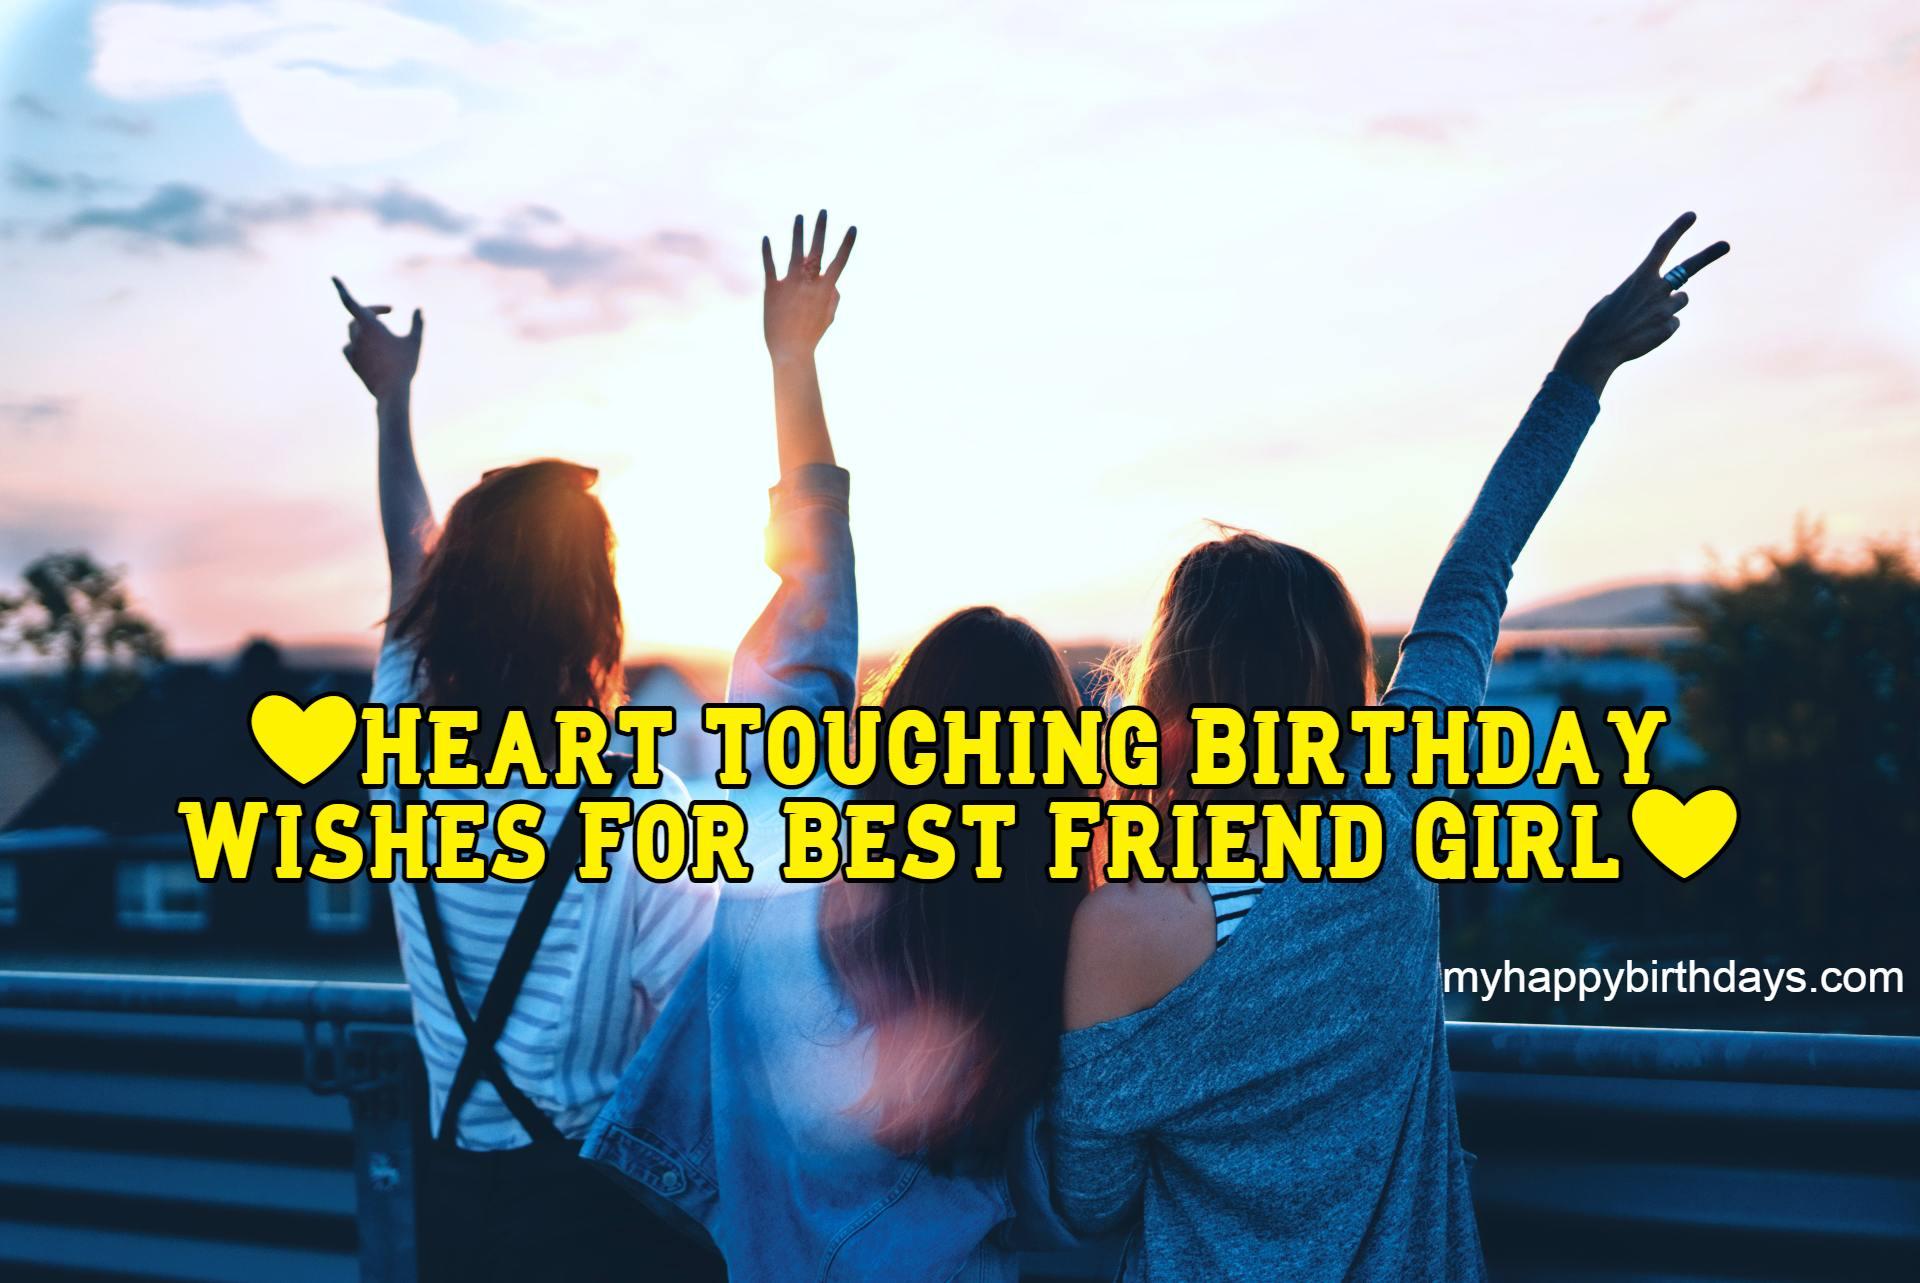 Heart Touching Birthday Wishes For Best Friend Girl | Happy Birthday My Friend